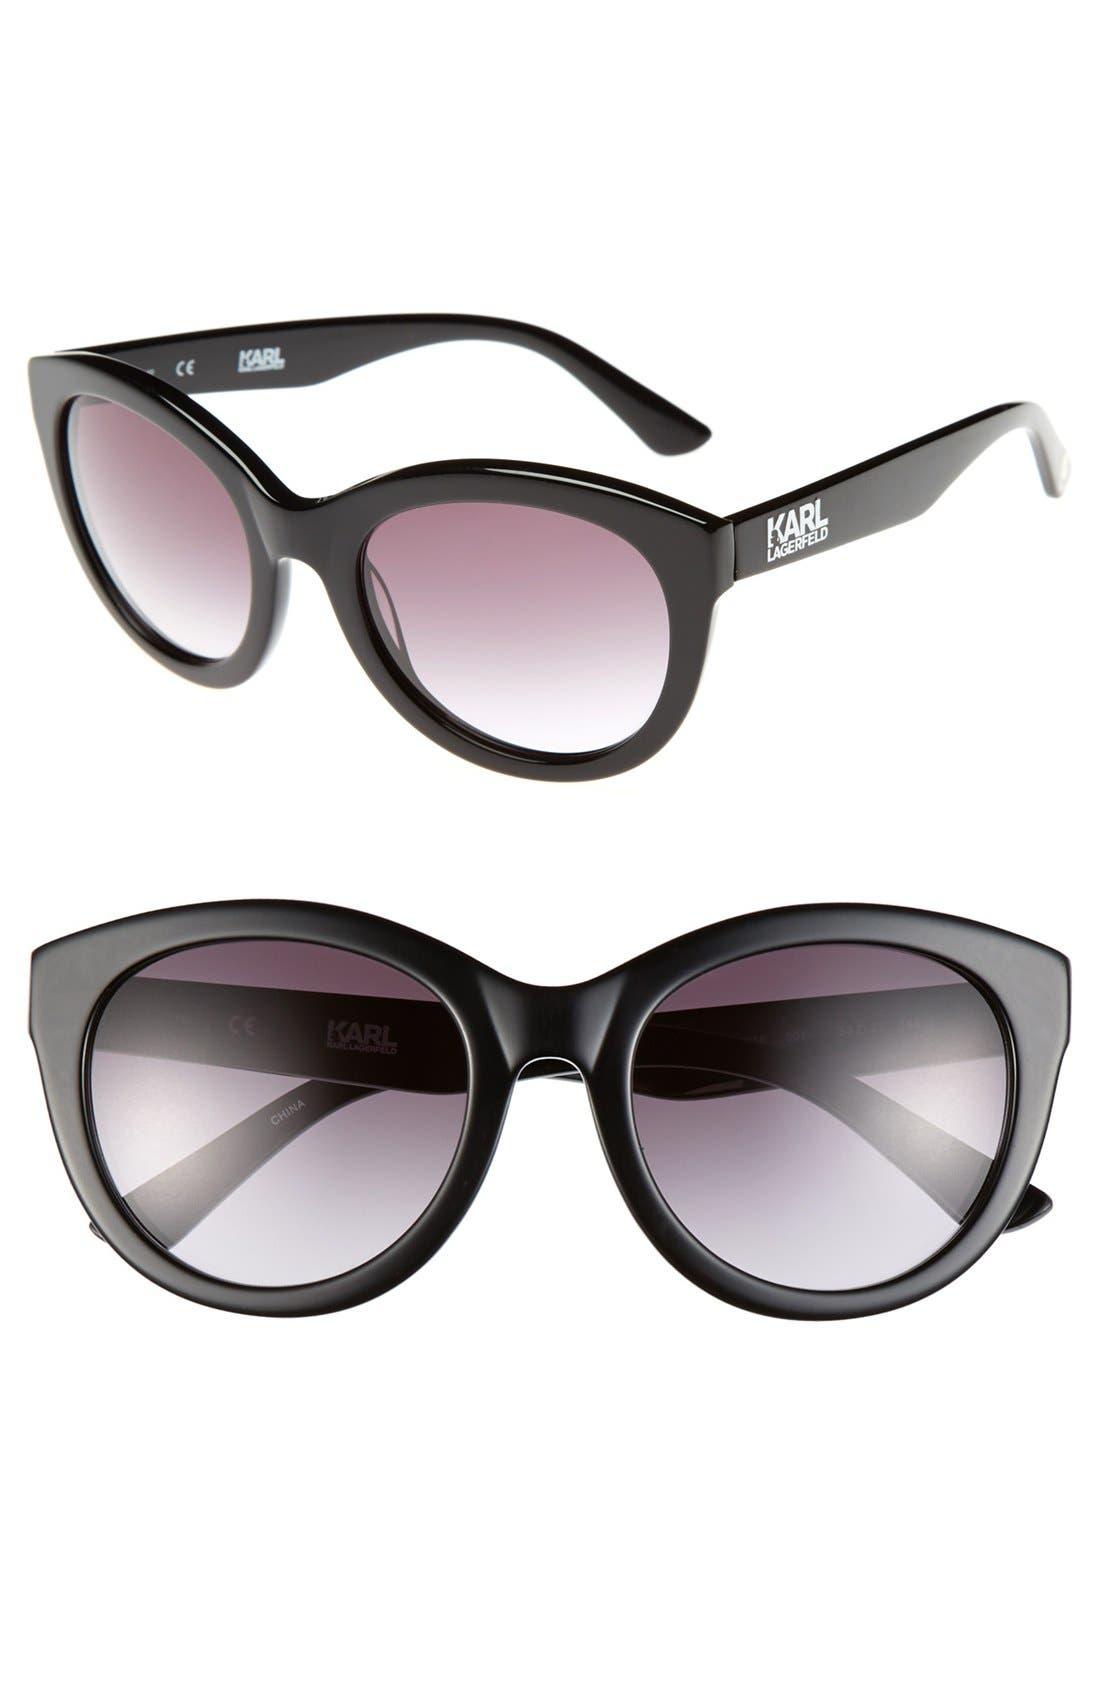 Main Image - Karl Lagerfeld 53mm Cat Eye Sunglasses